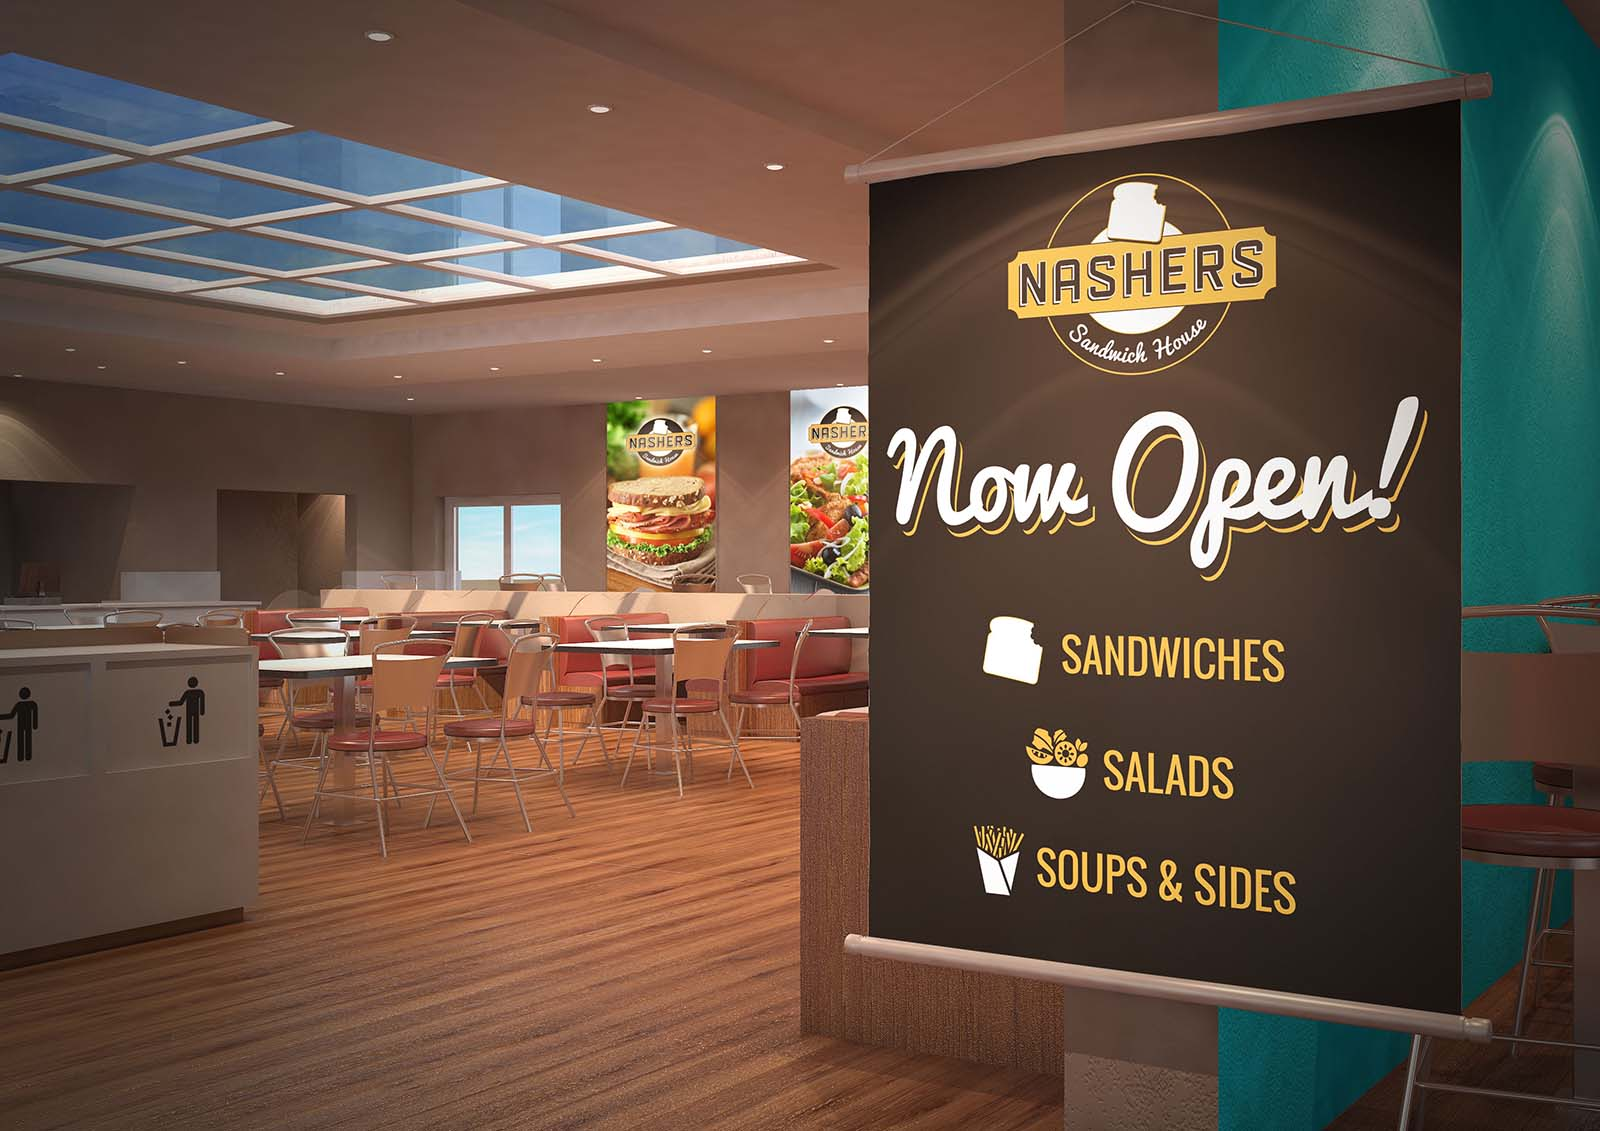 nashers-menuboard-design